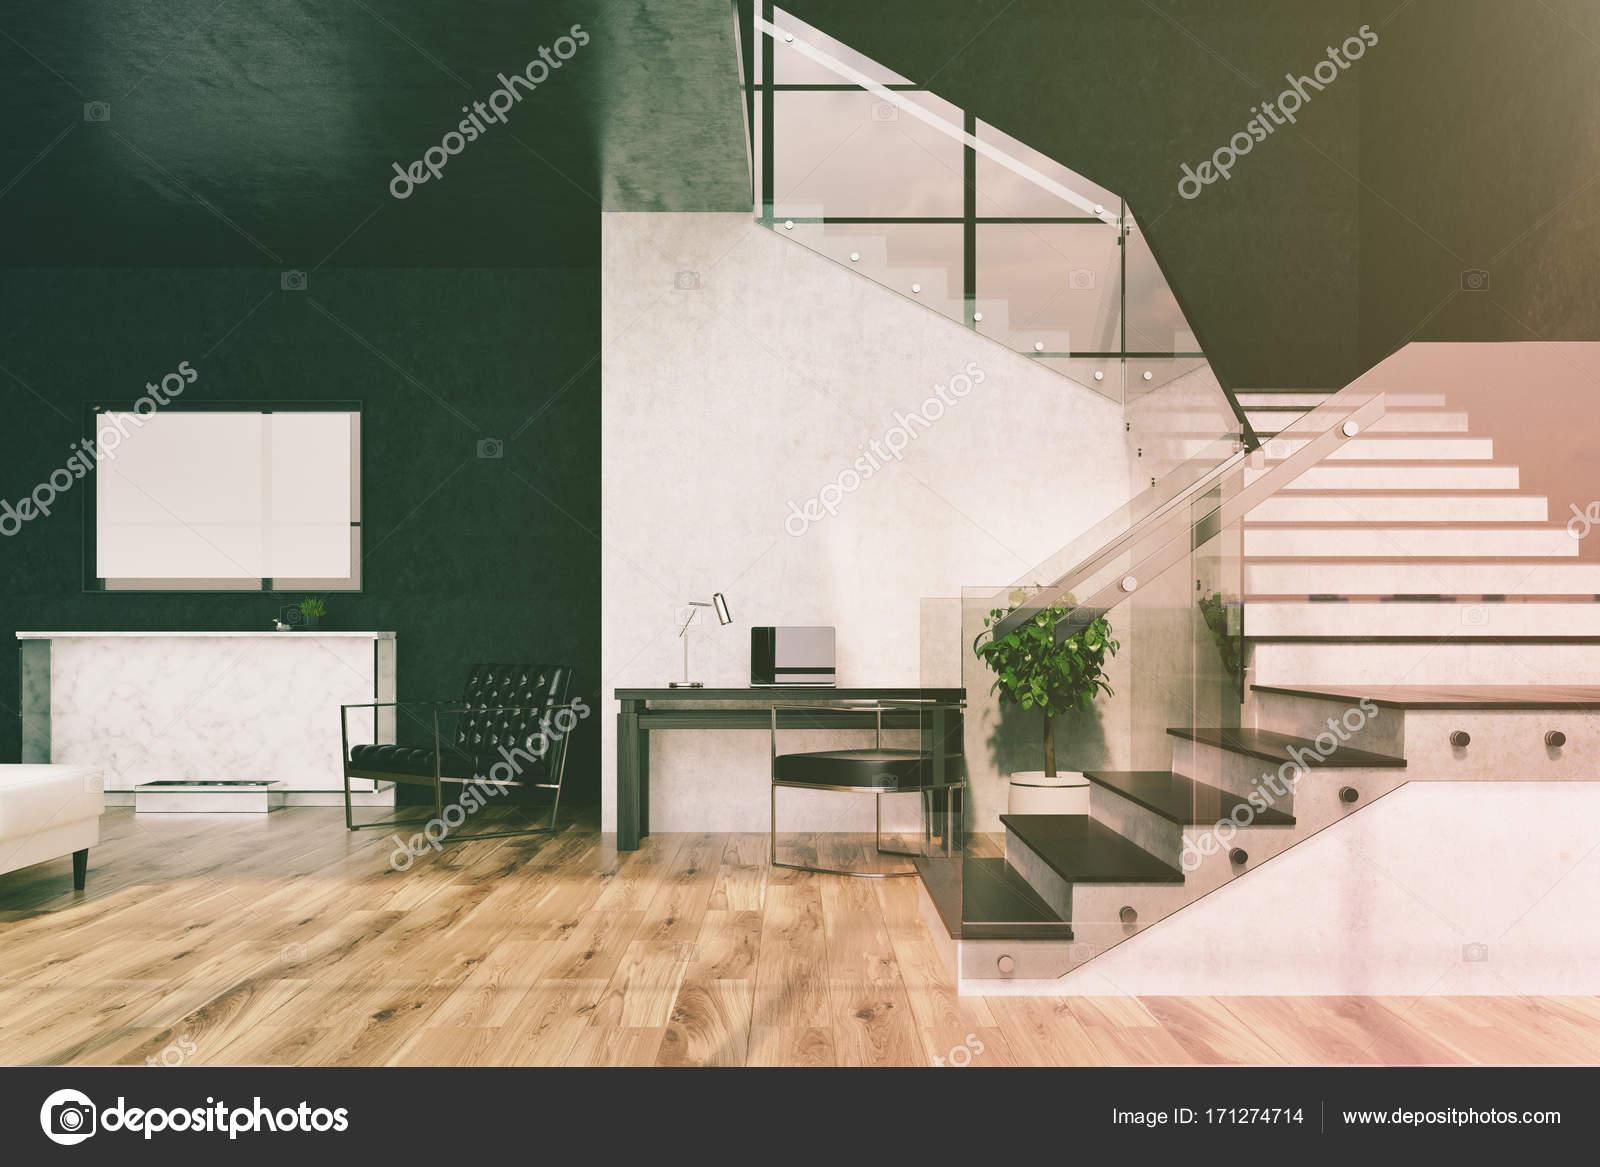 Marmer In Woonkamer : Zwart marmer woonkamer open haard poster toned u stockfoto